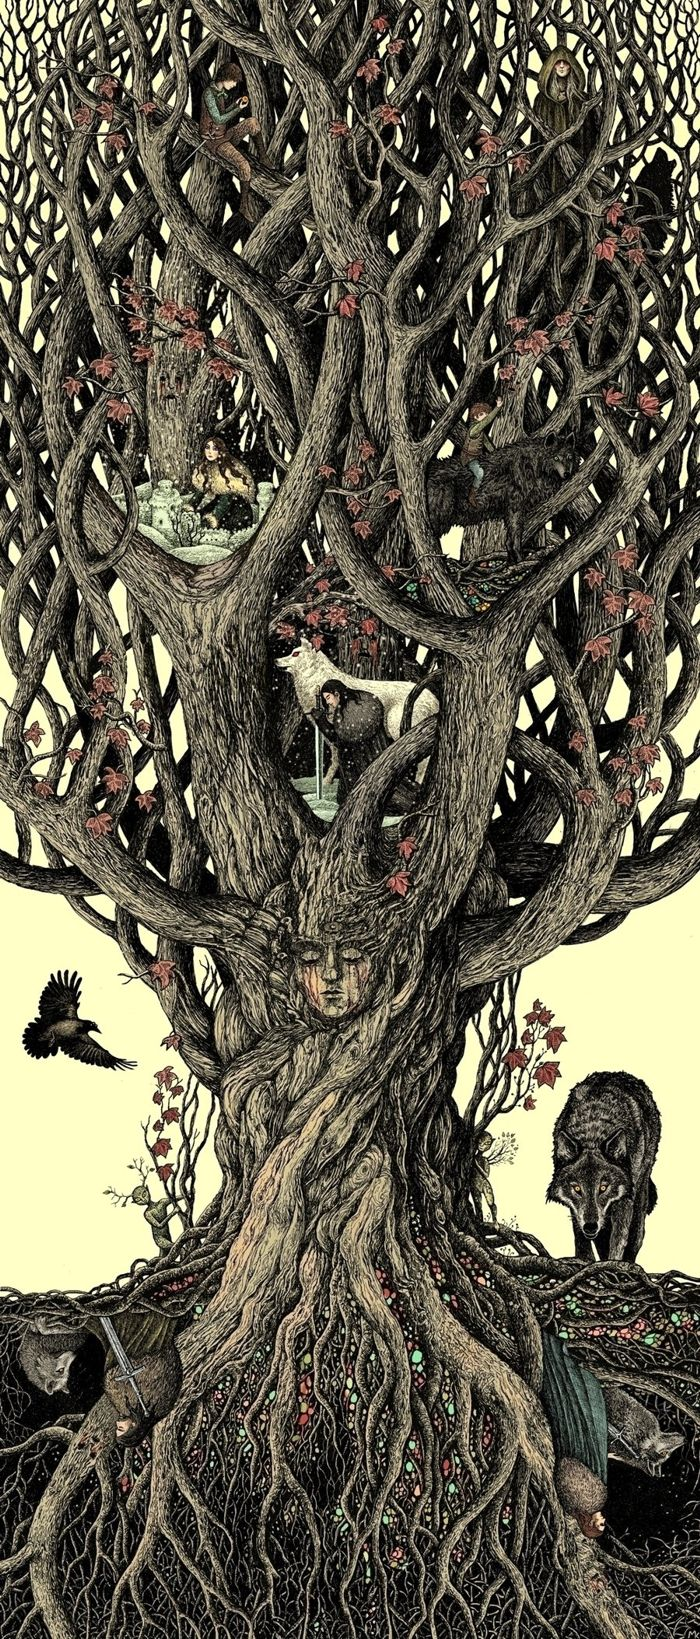 Magdalena Korzeniewska - Under the Heart Tree